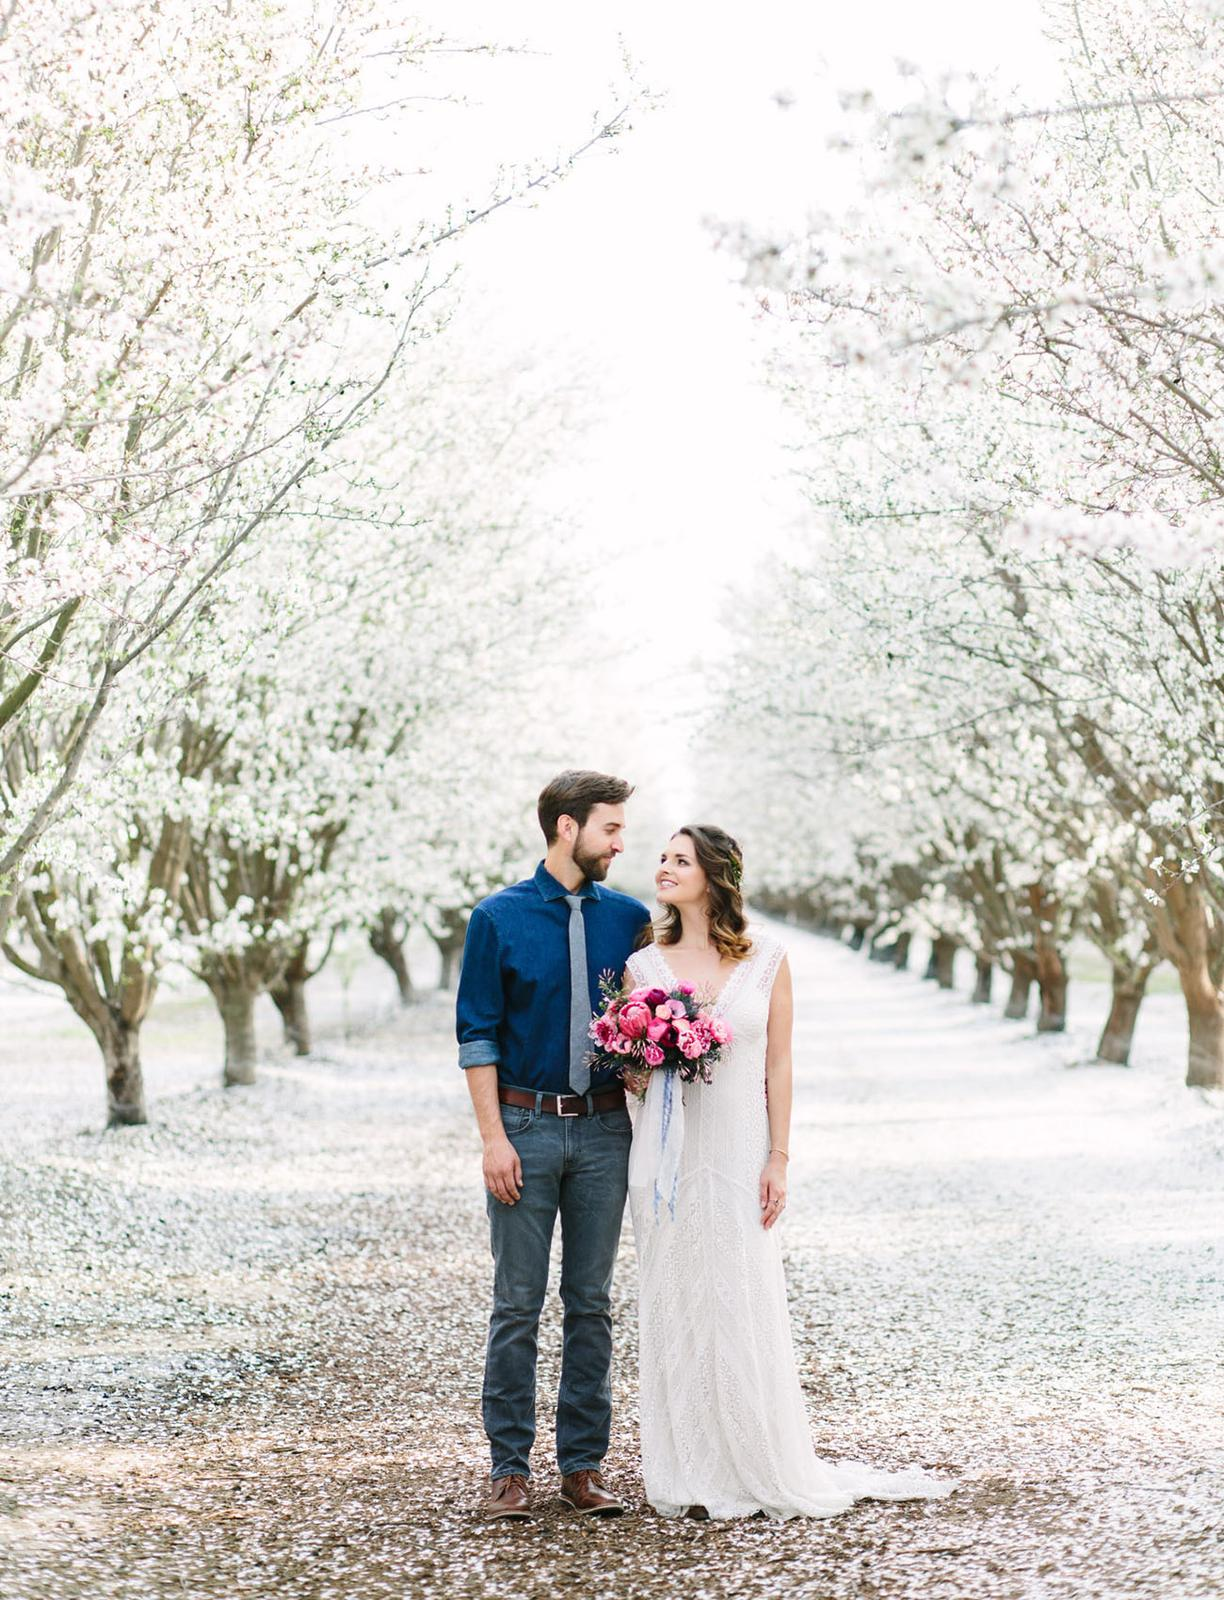 Svadba v ovocnom sade - Obrázok č. 76